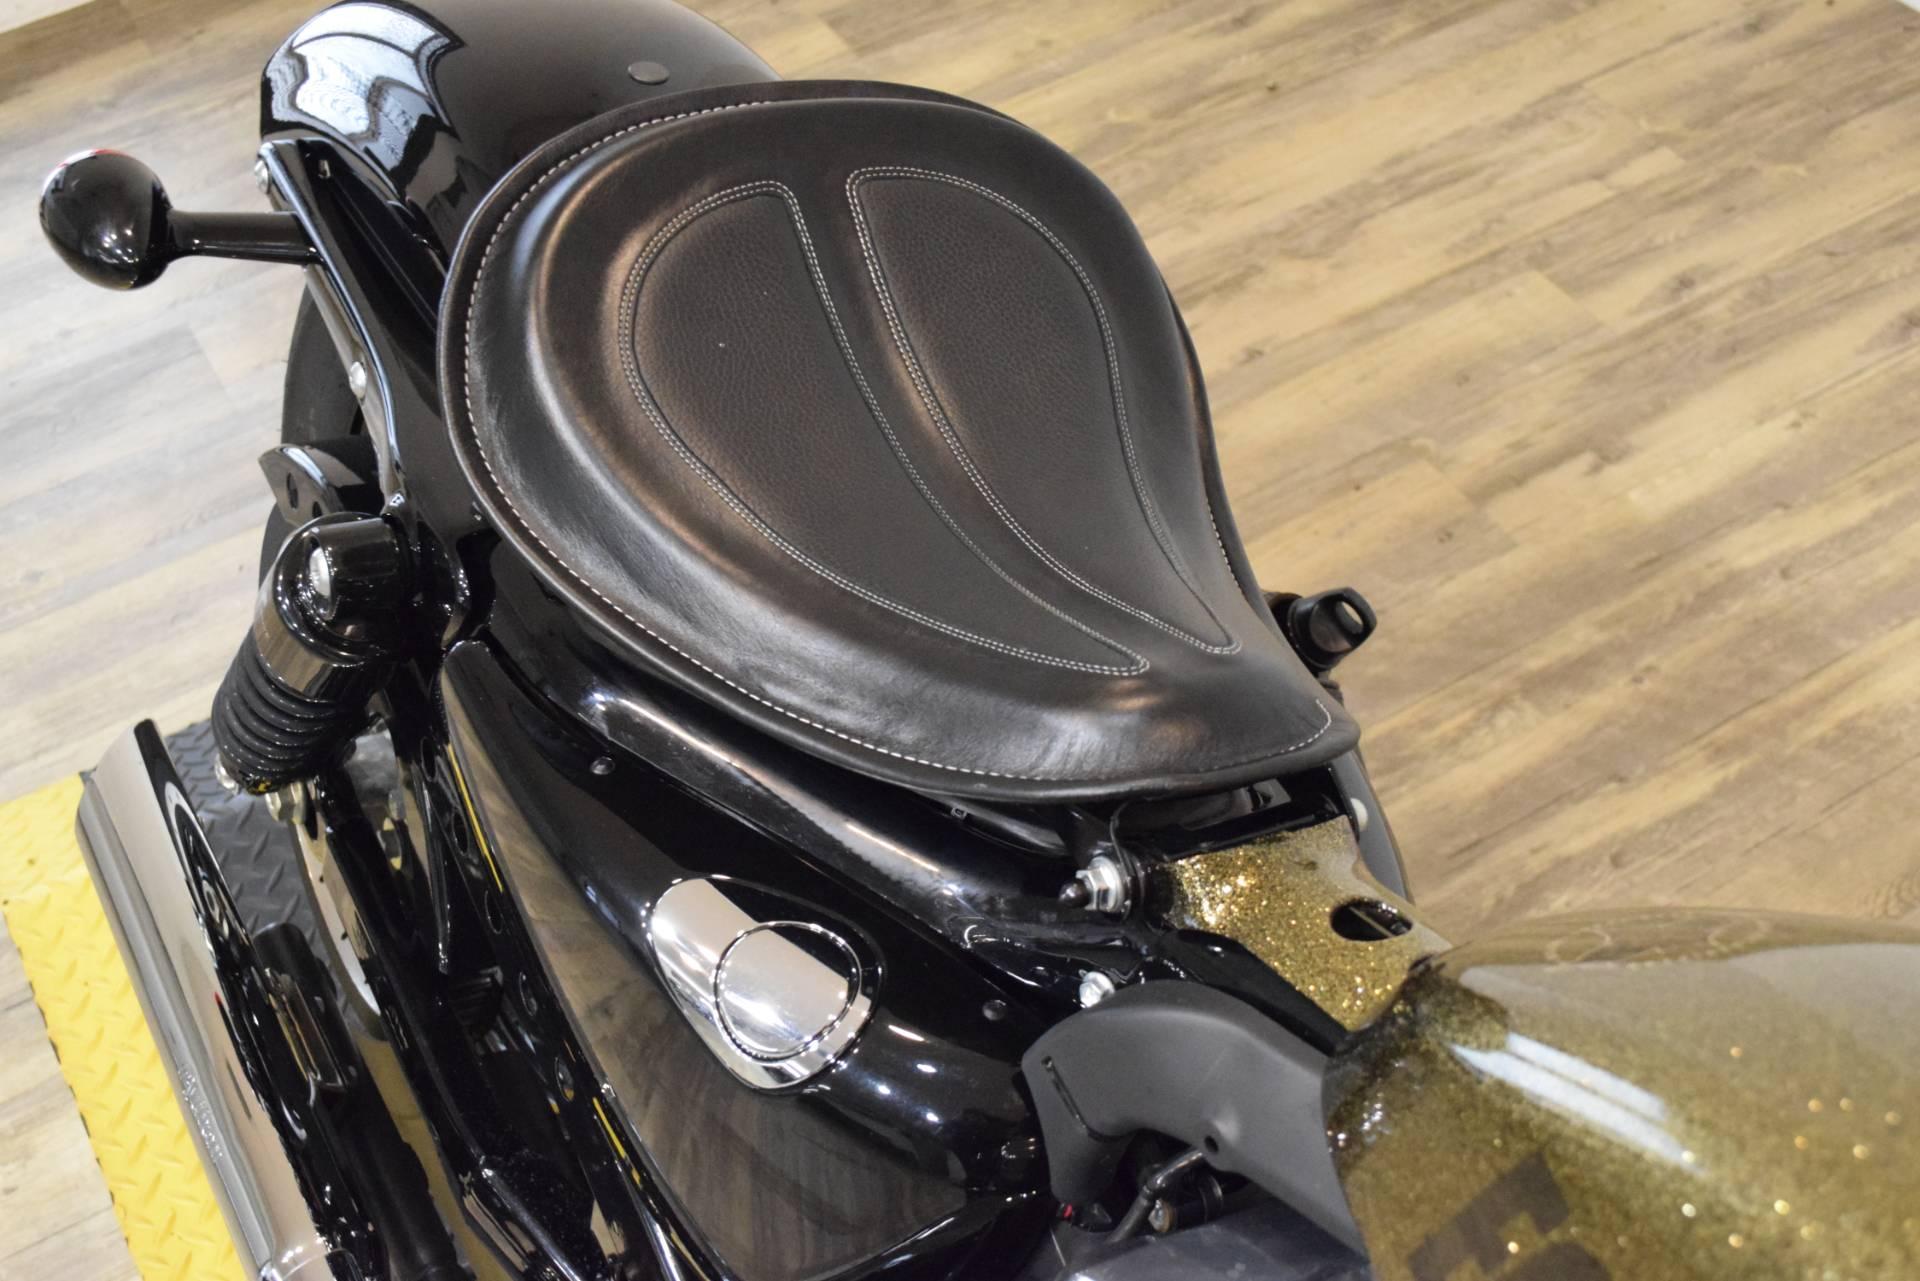 2013 Harley-Davidson Sportster Forty-Eight 6